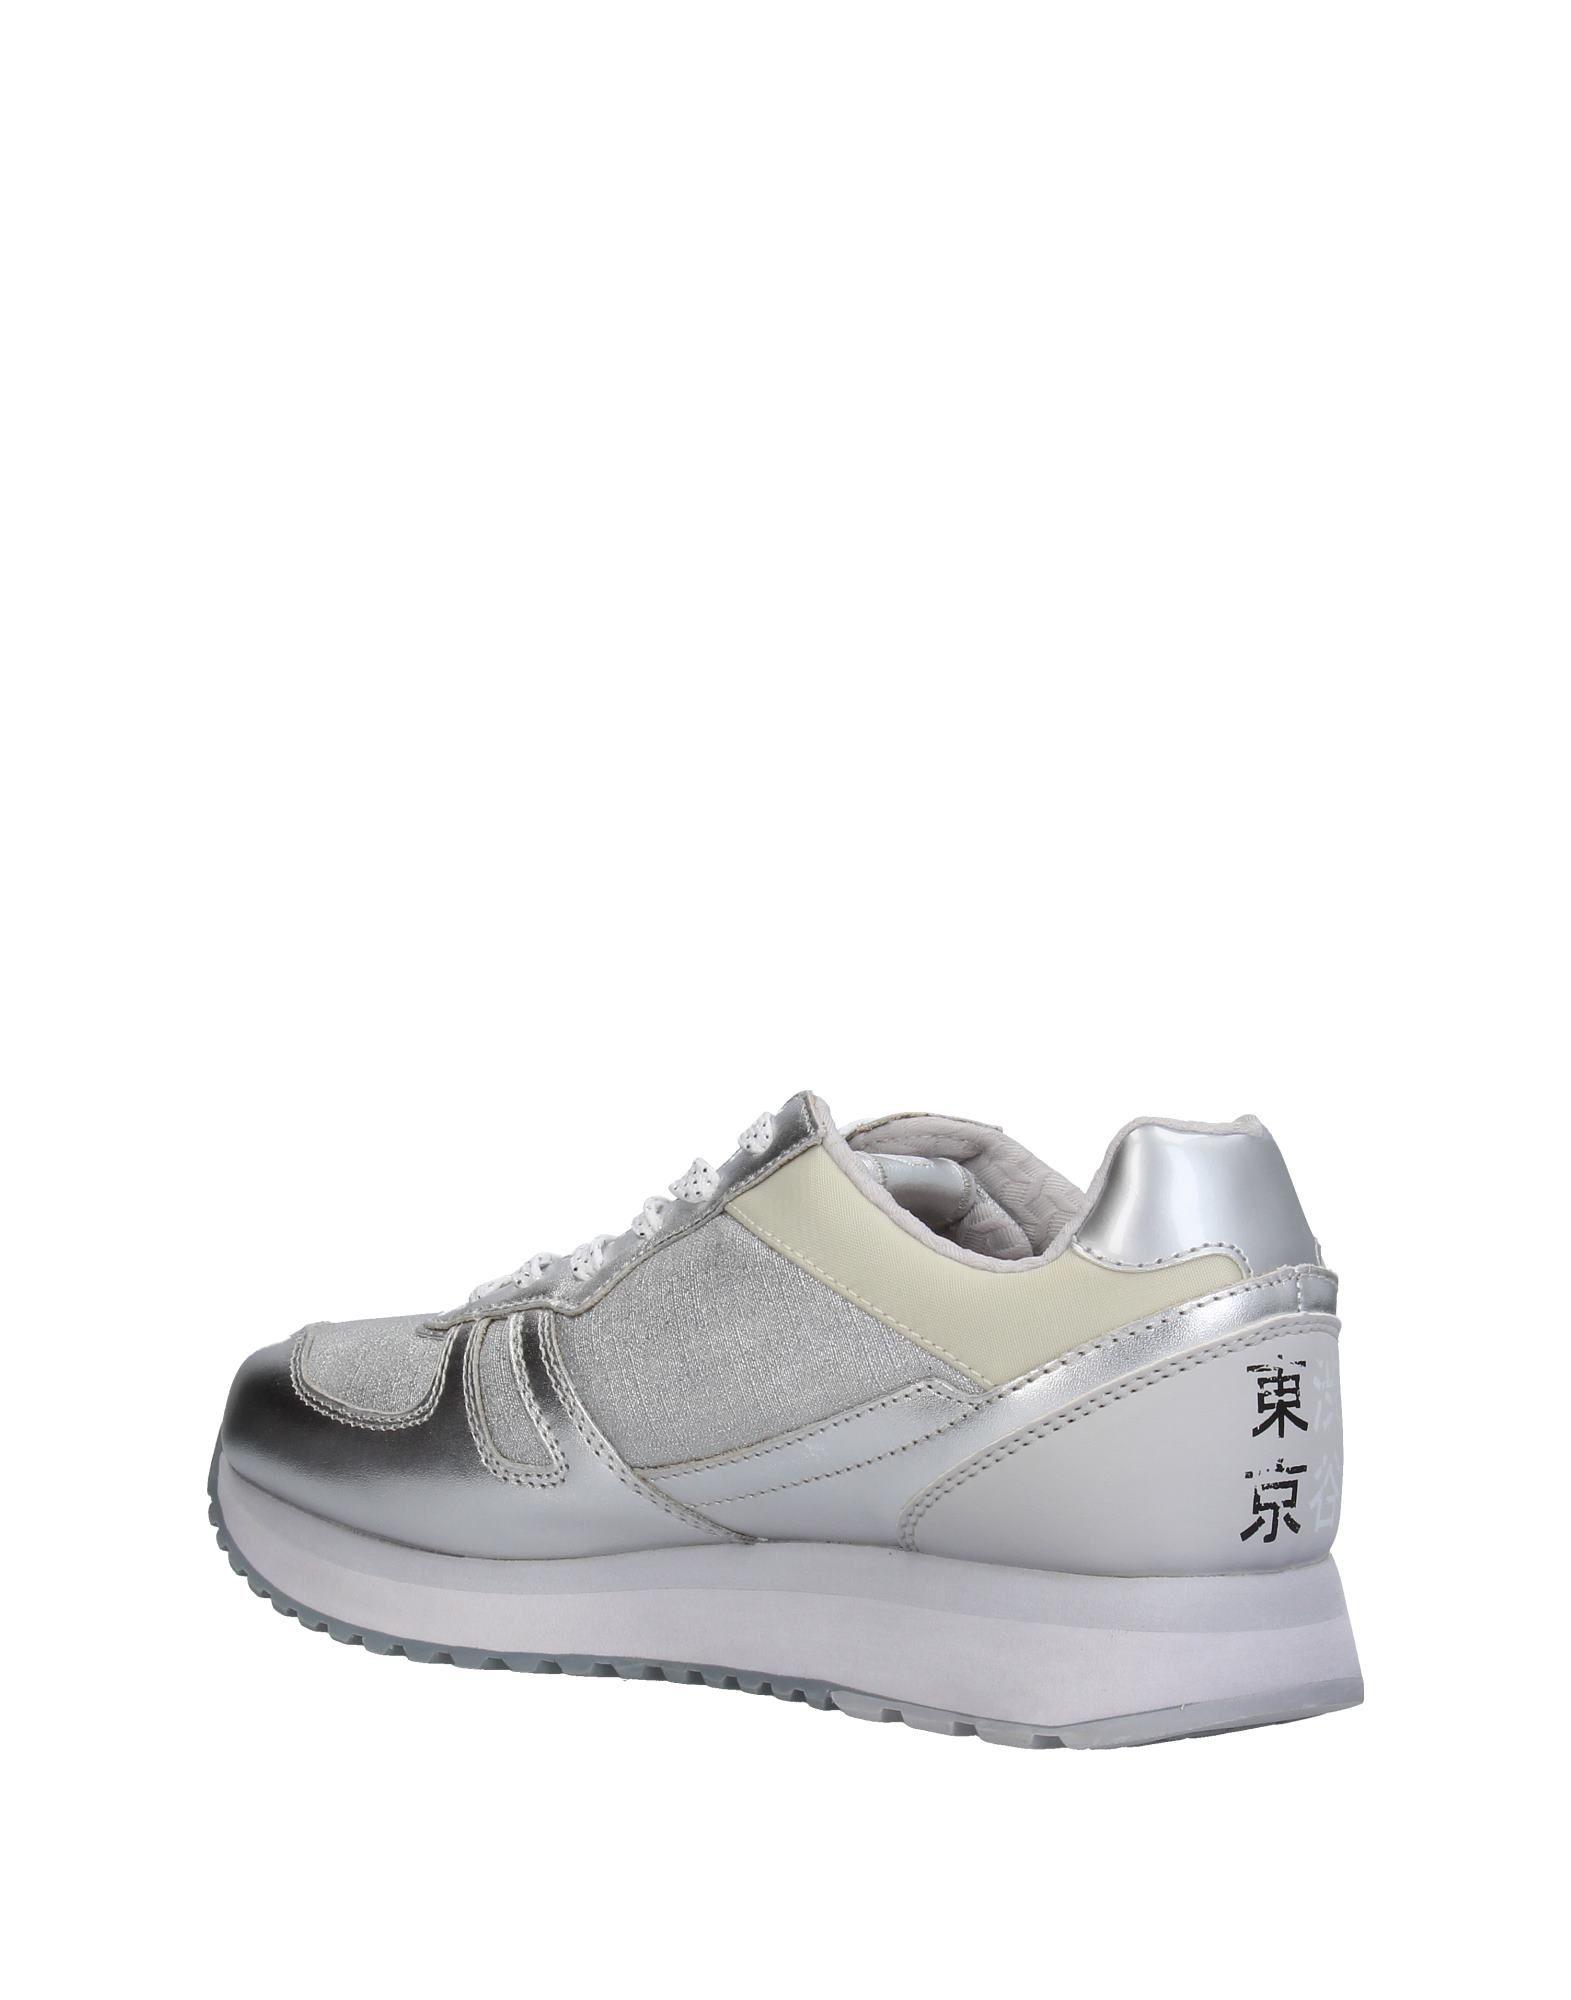 Lotto Leggenda Sneakers Damen  11351430CA Gute Qualität beliebte Schuhe